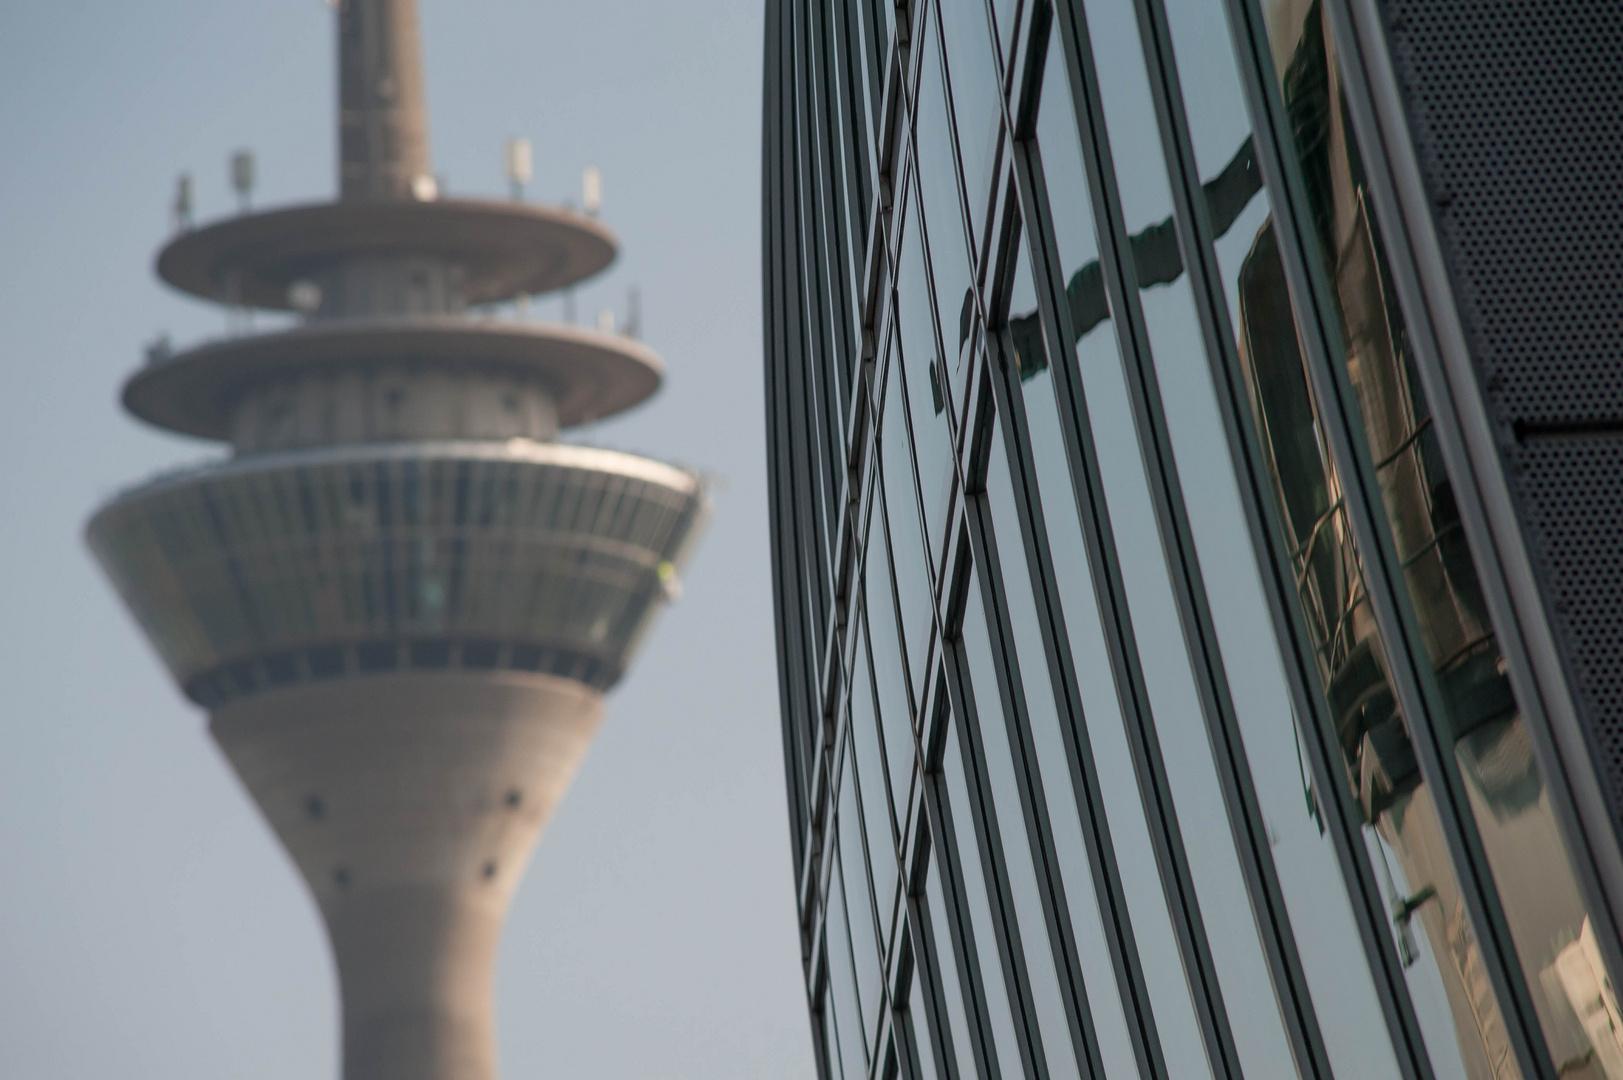 Fernsehturm Düsseldorf # 9